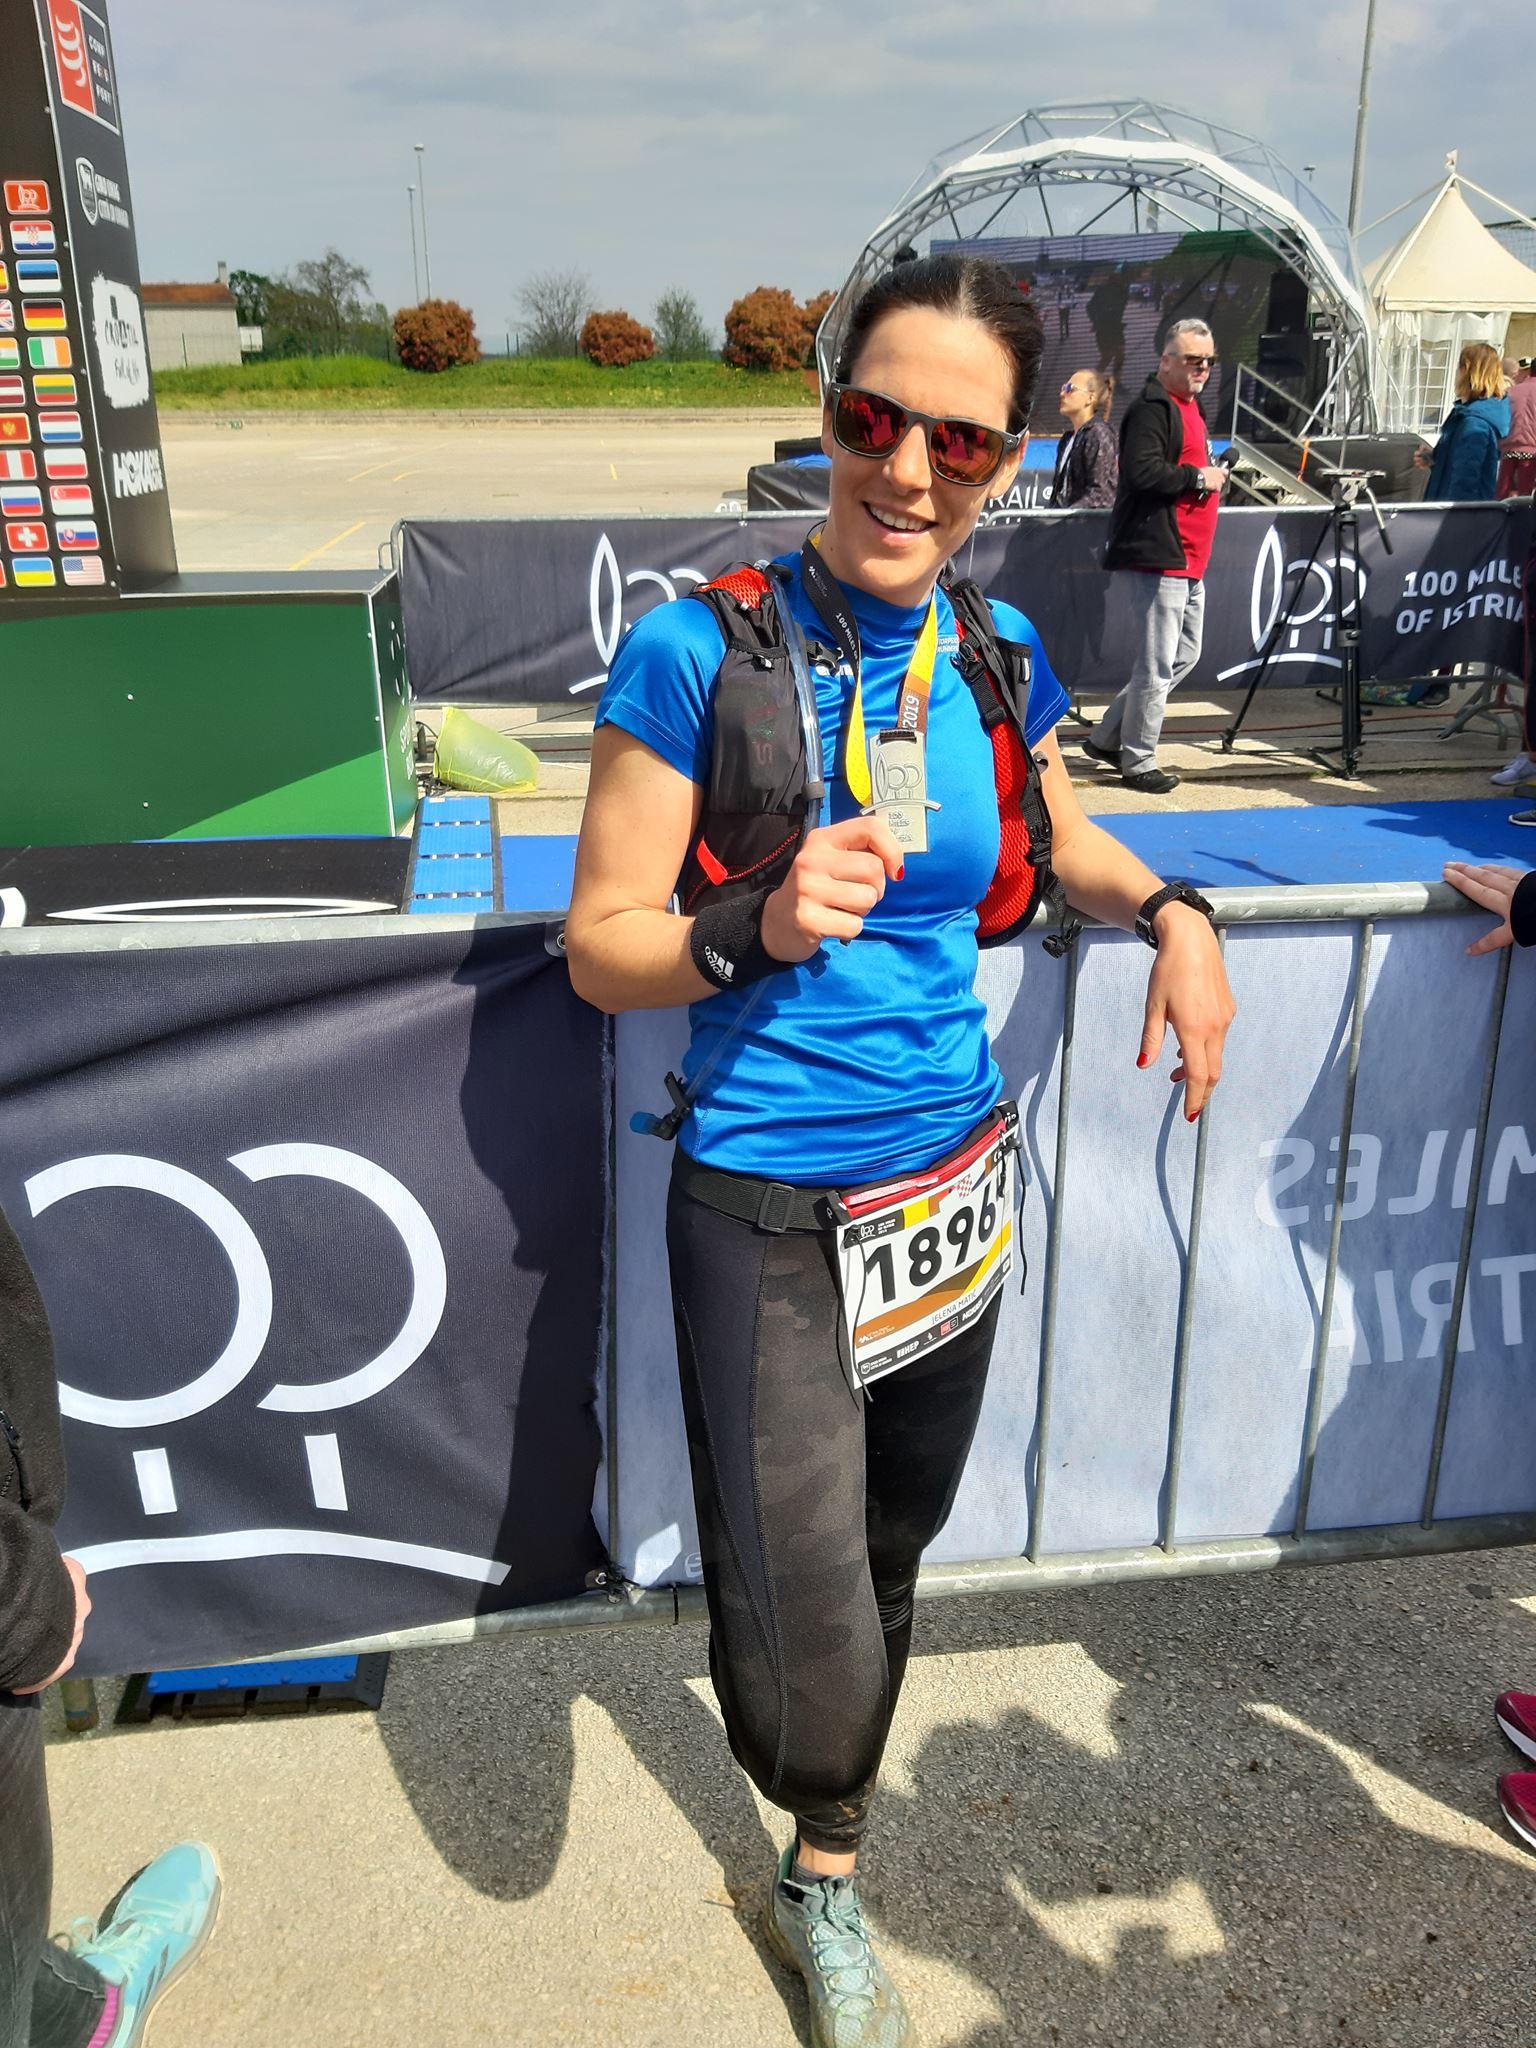 100 milja Istre, Jelena Matić, Foto Torpedo runners